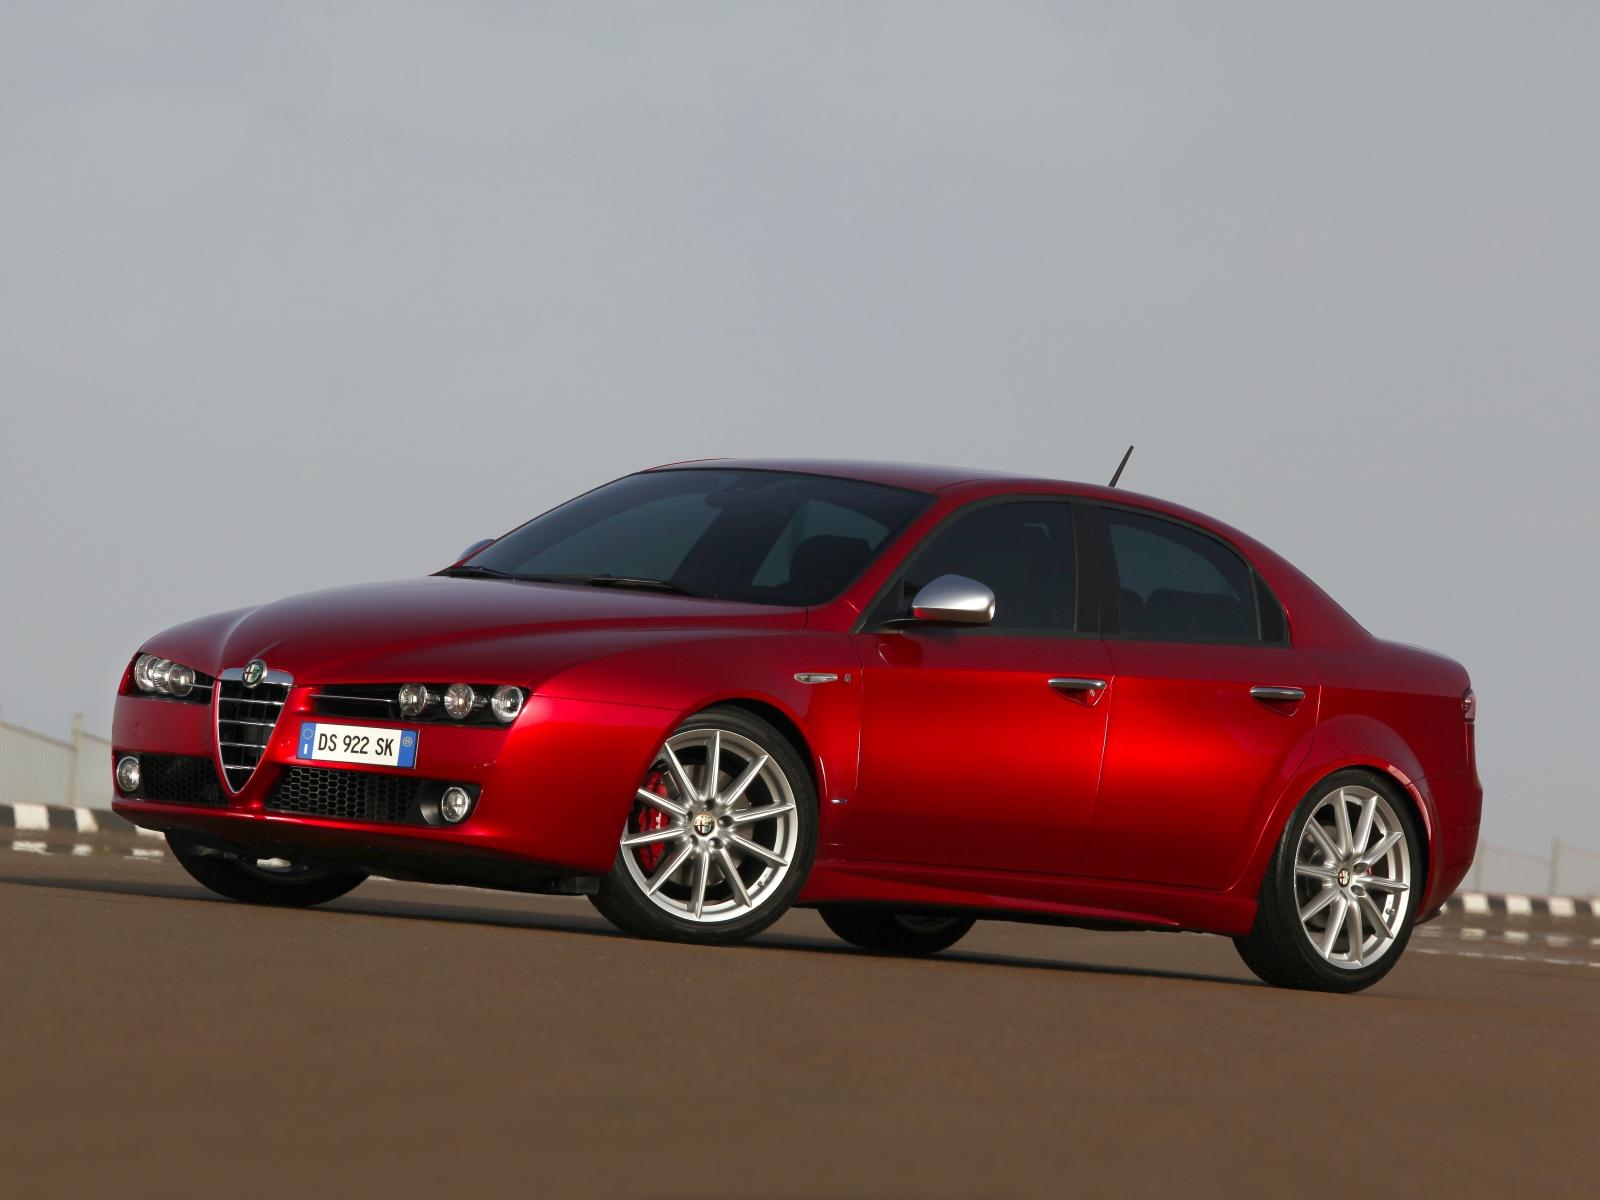 2009 Alfa Romeo 159 Motor Desktop border=